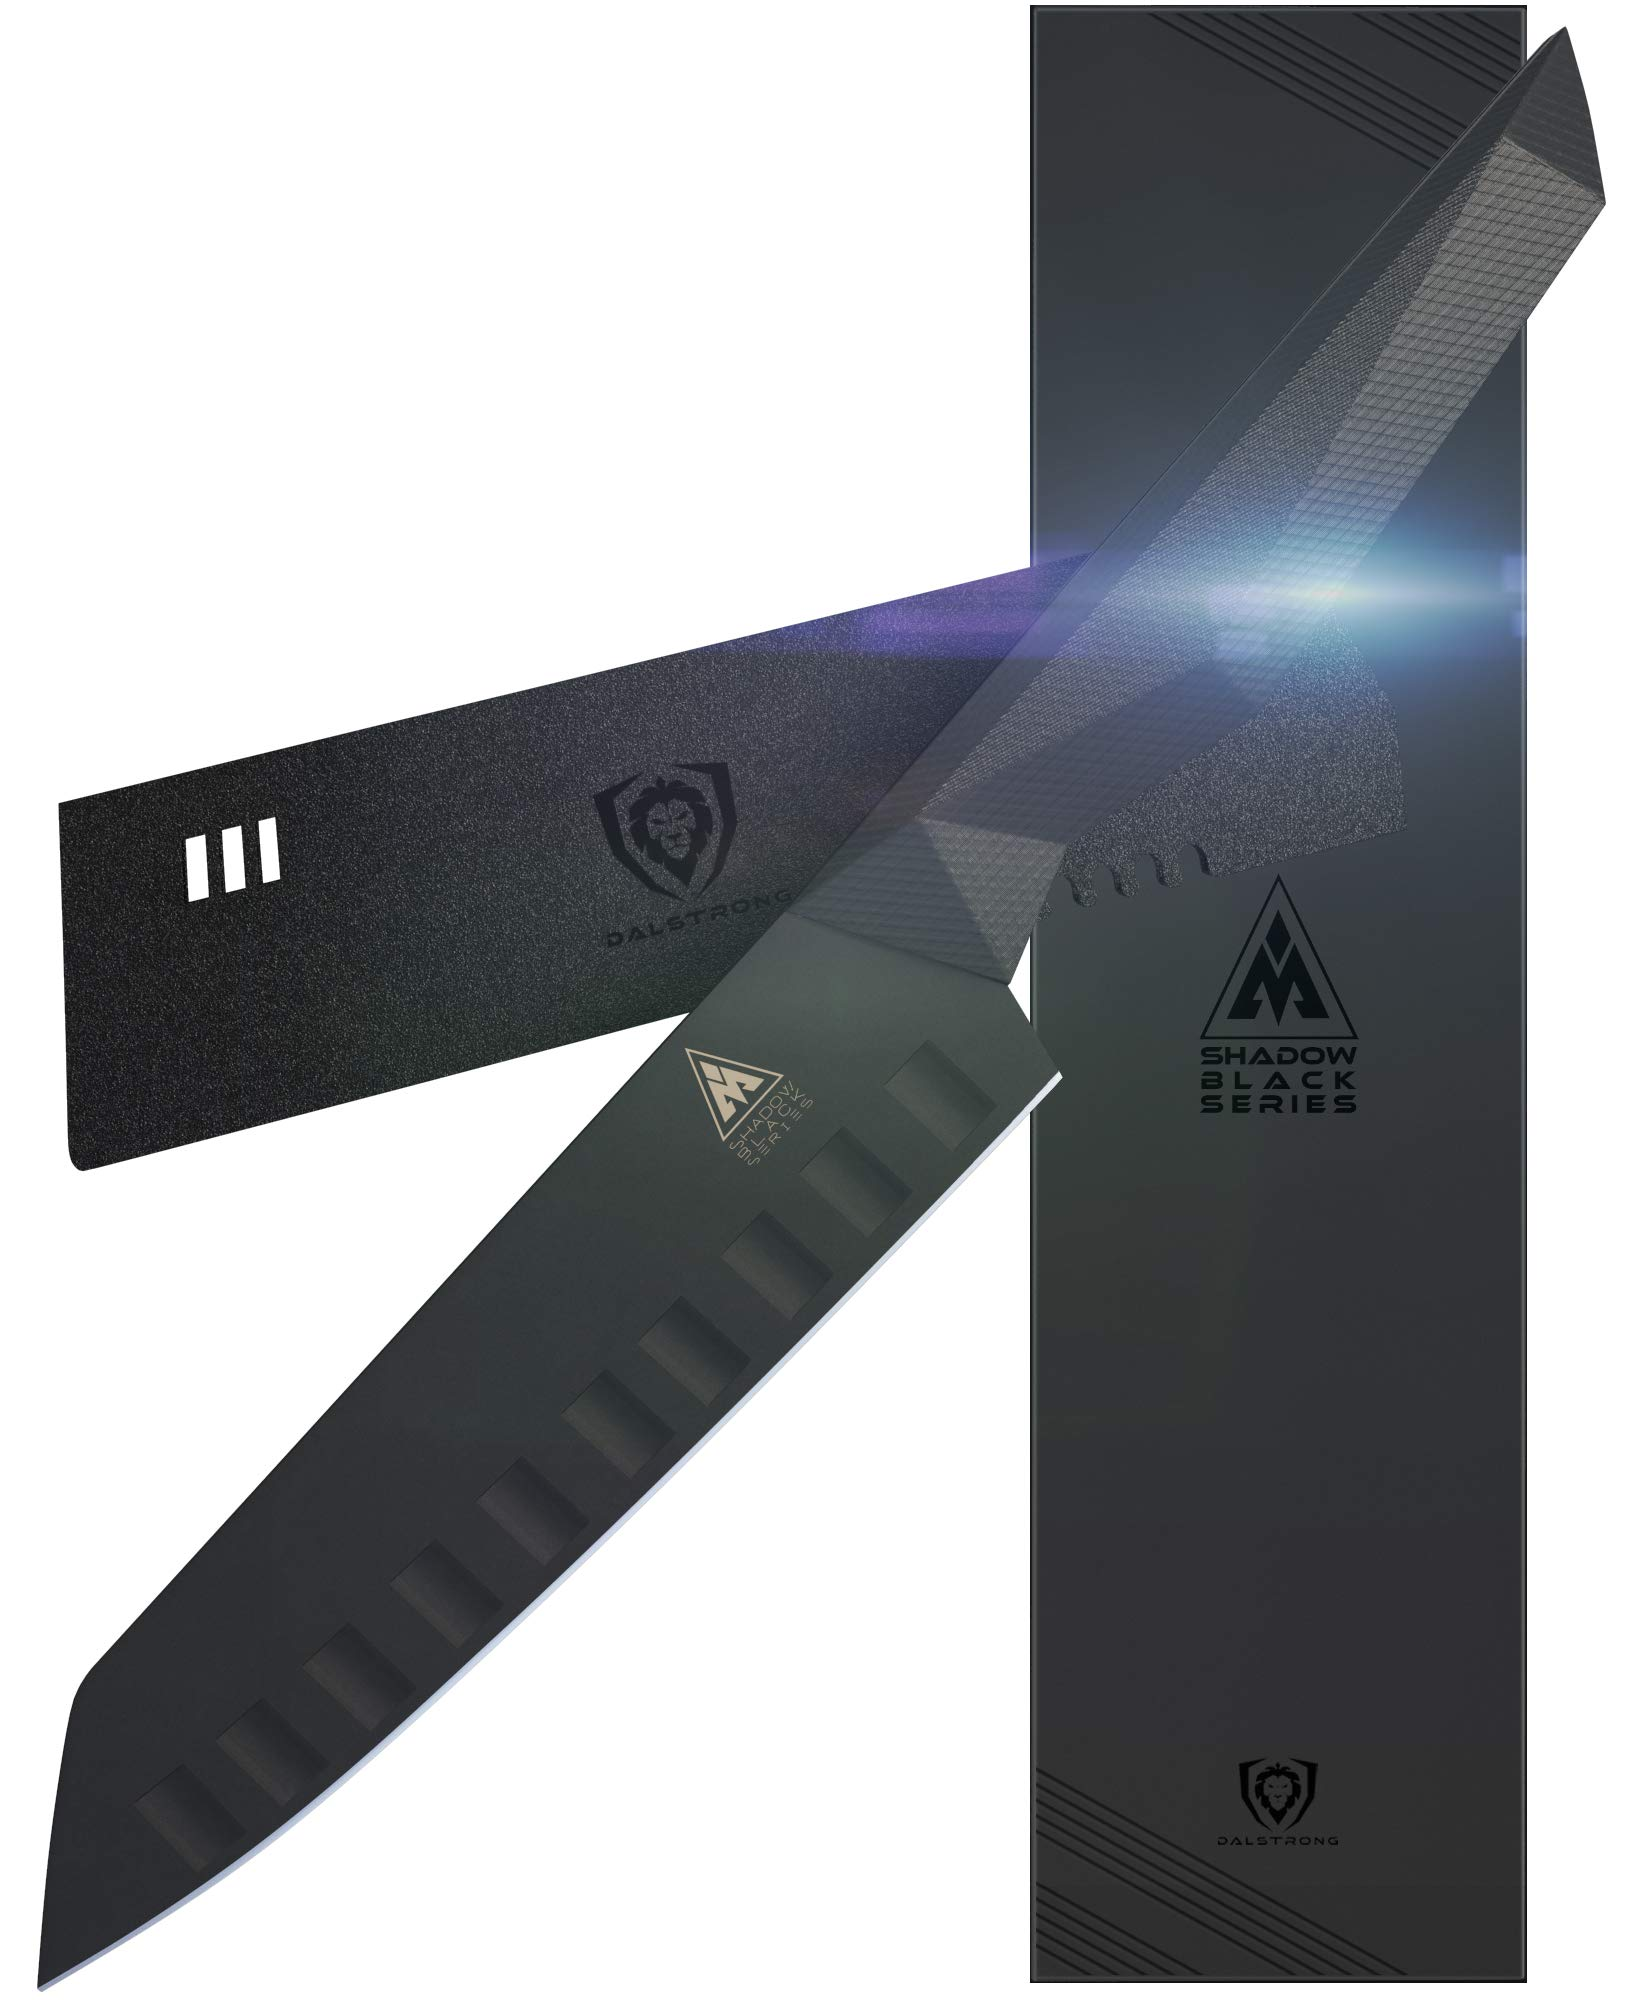 Dalstrong - Shadow Black Series - Black Titanium Nitride Coated - High Carbon - 7CR17MOV-X Vacuum Treated Steel- Sheath (7'' Santoku) - NSF Certified